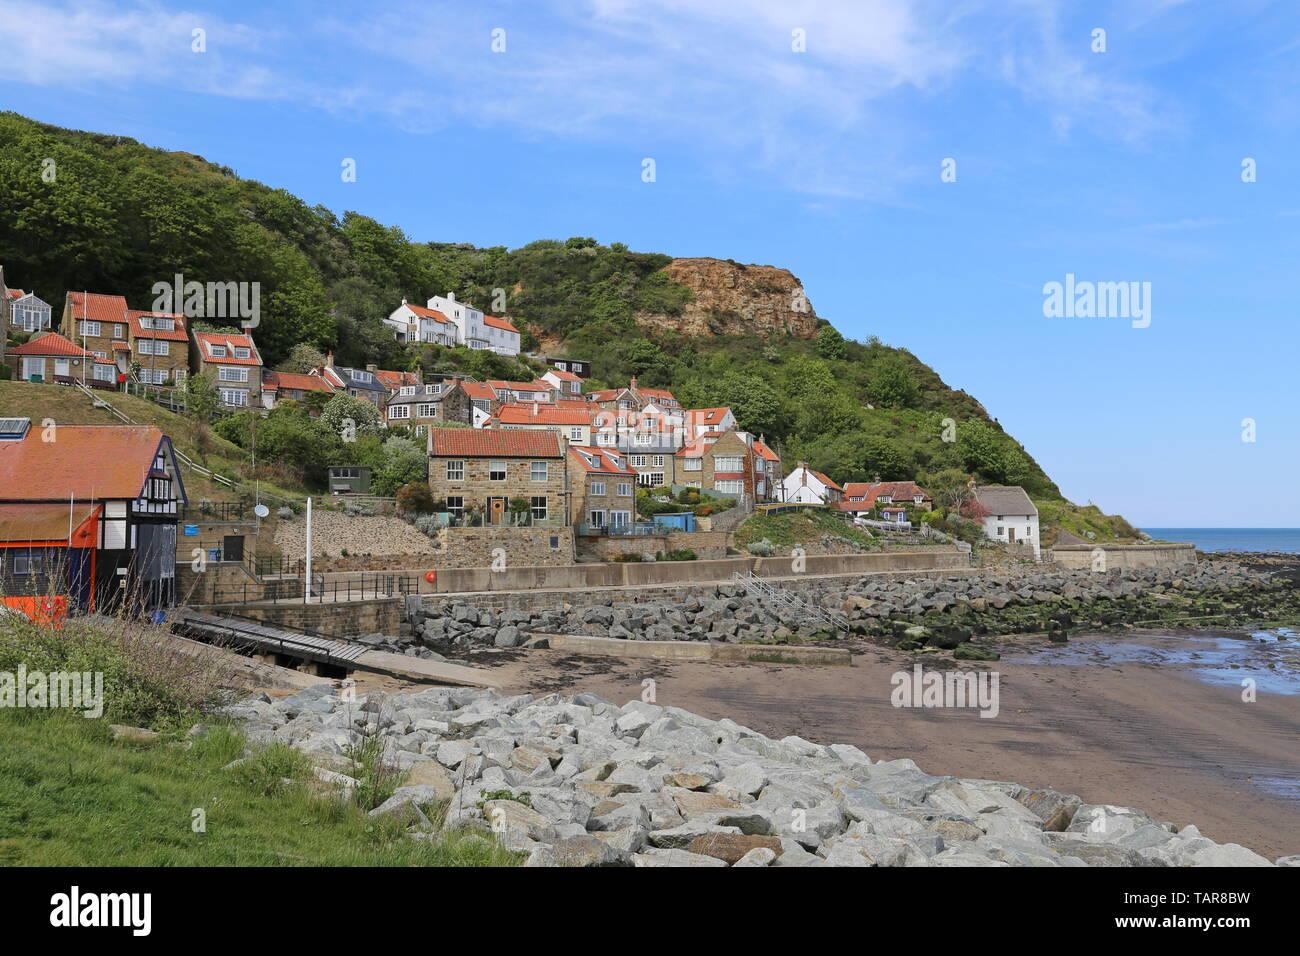 Runswick, Borough of Scarborough, North Yorkshire, England, Great Britain, United Kingdom, UK, Europe Stock Photo